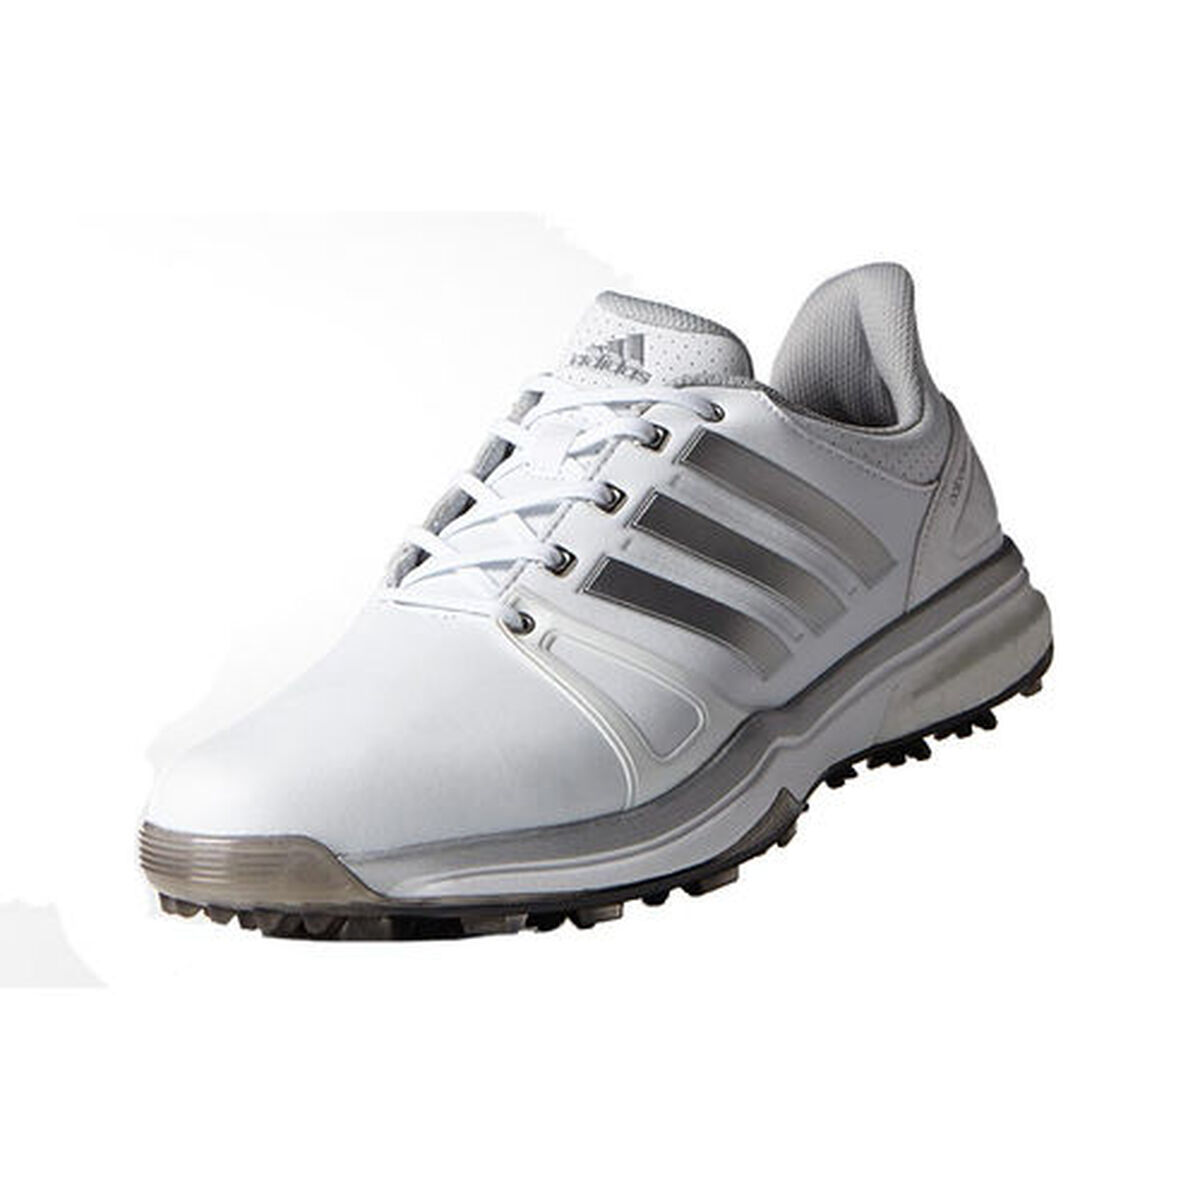 info for 4f3dd bda60 Images. adidas Adipower Boost 2 Men39s Golf Shoe ...